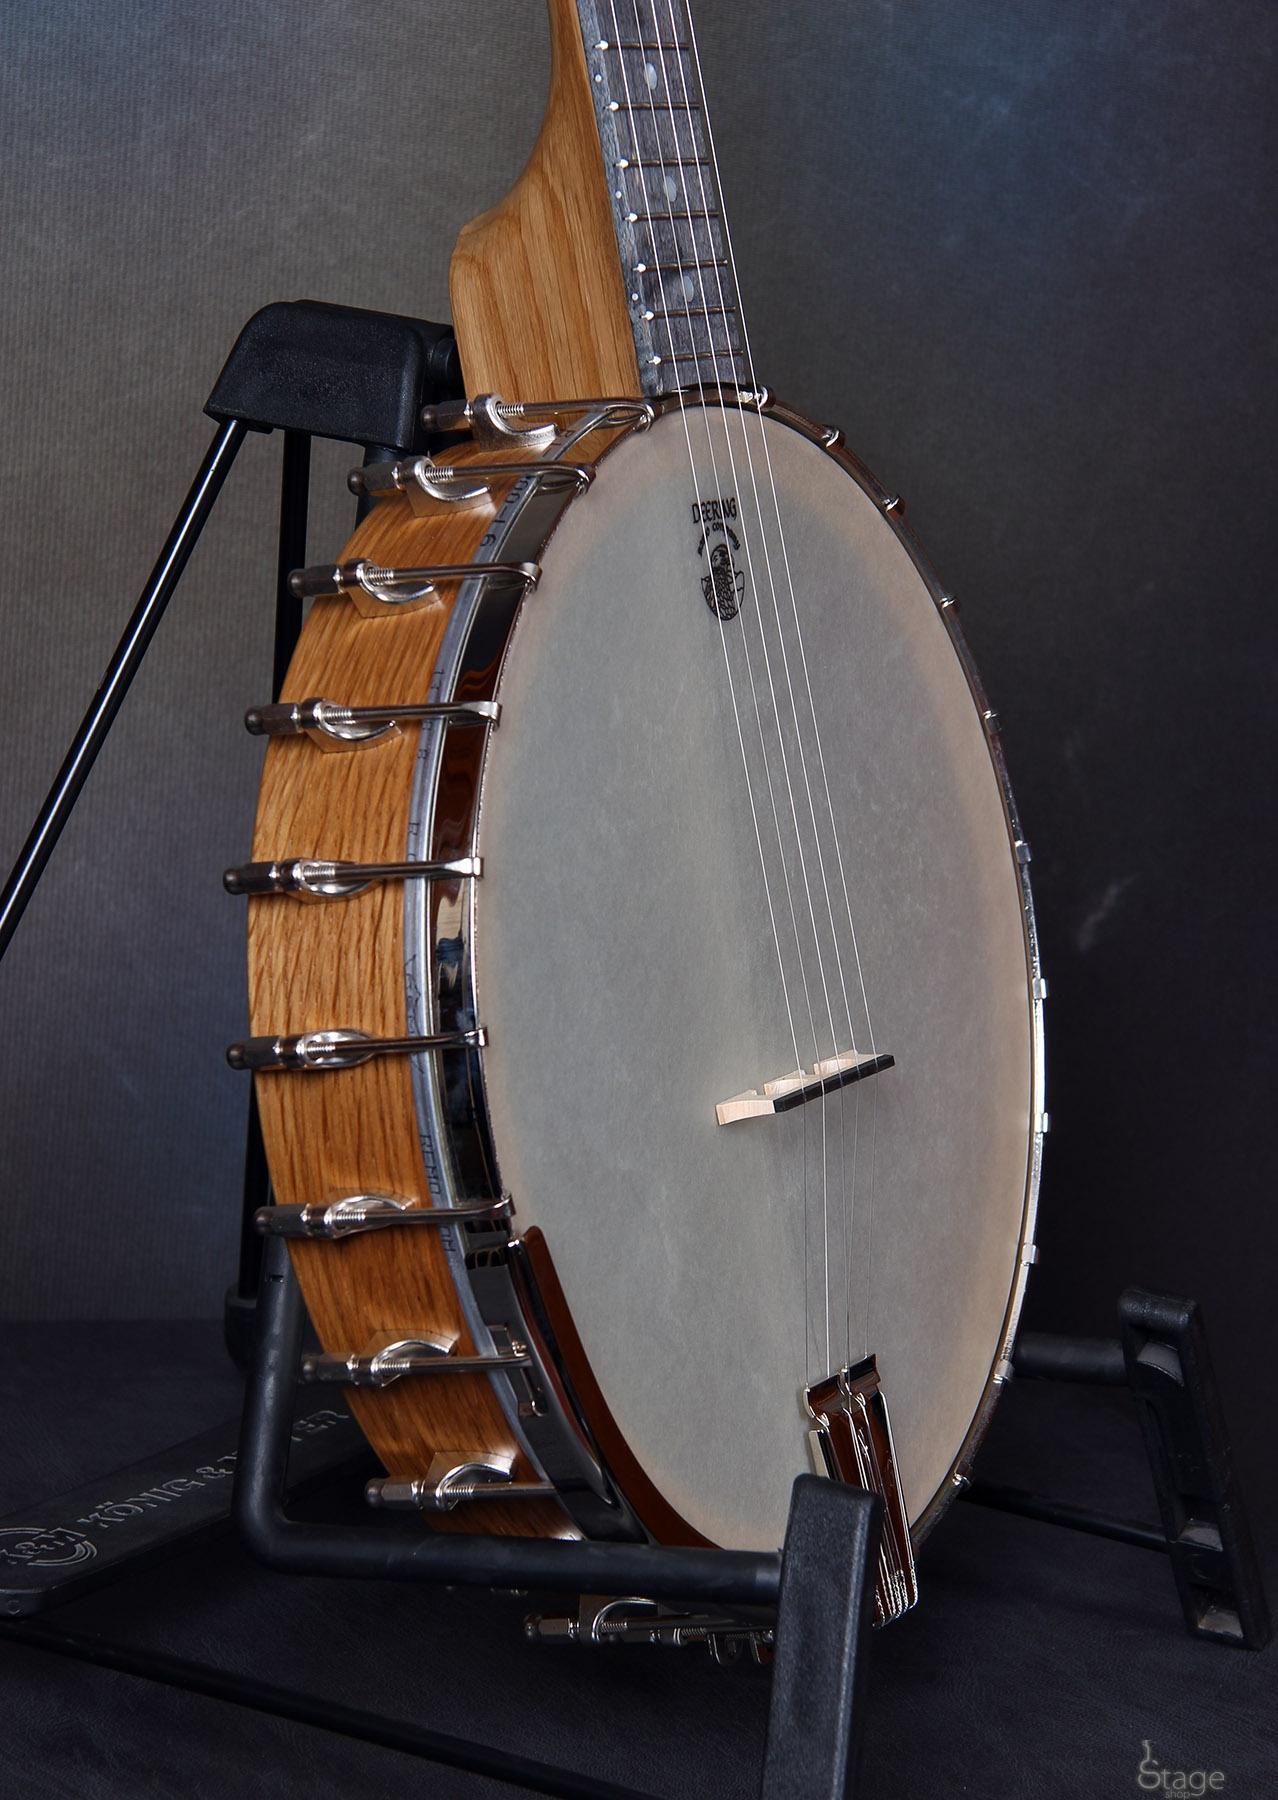 Vega White Oak Openback 12